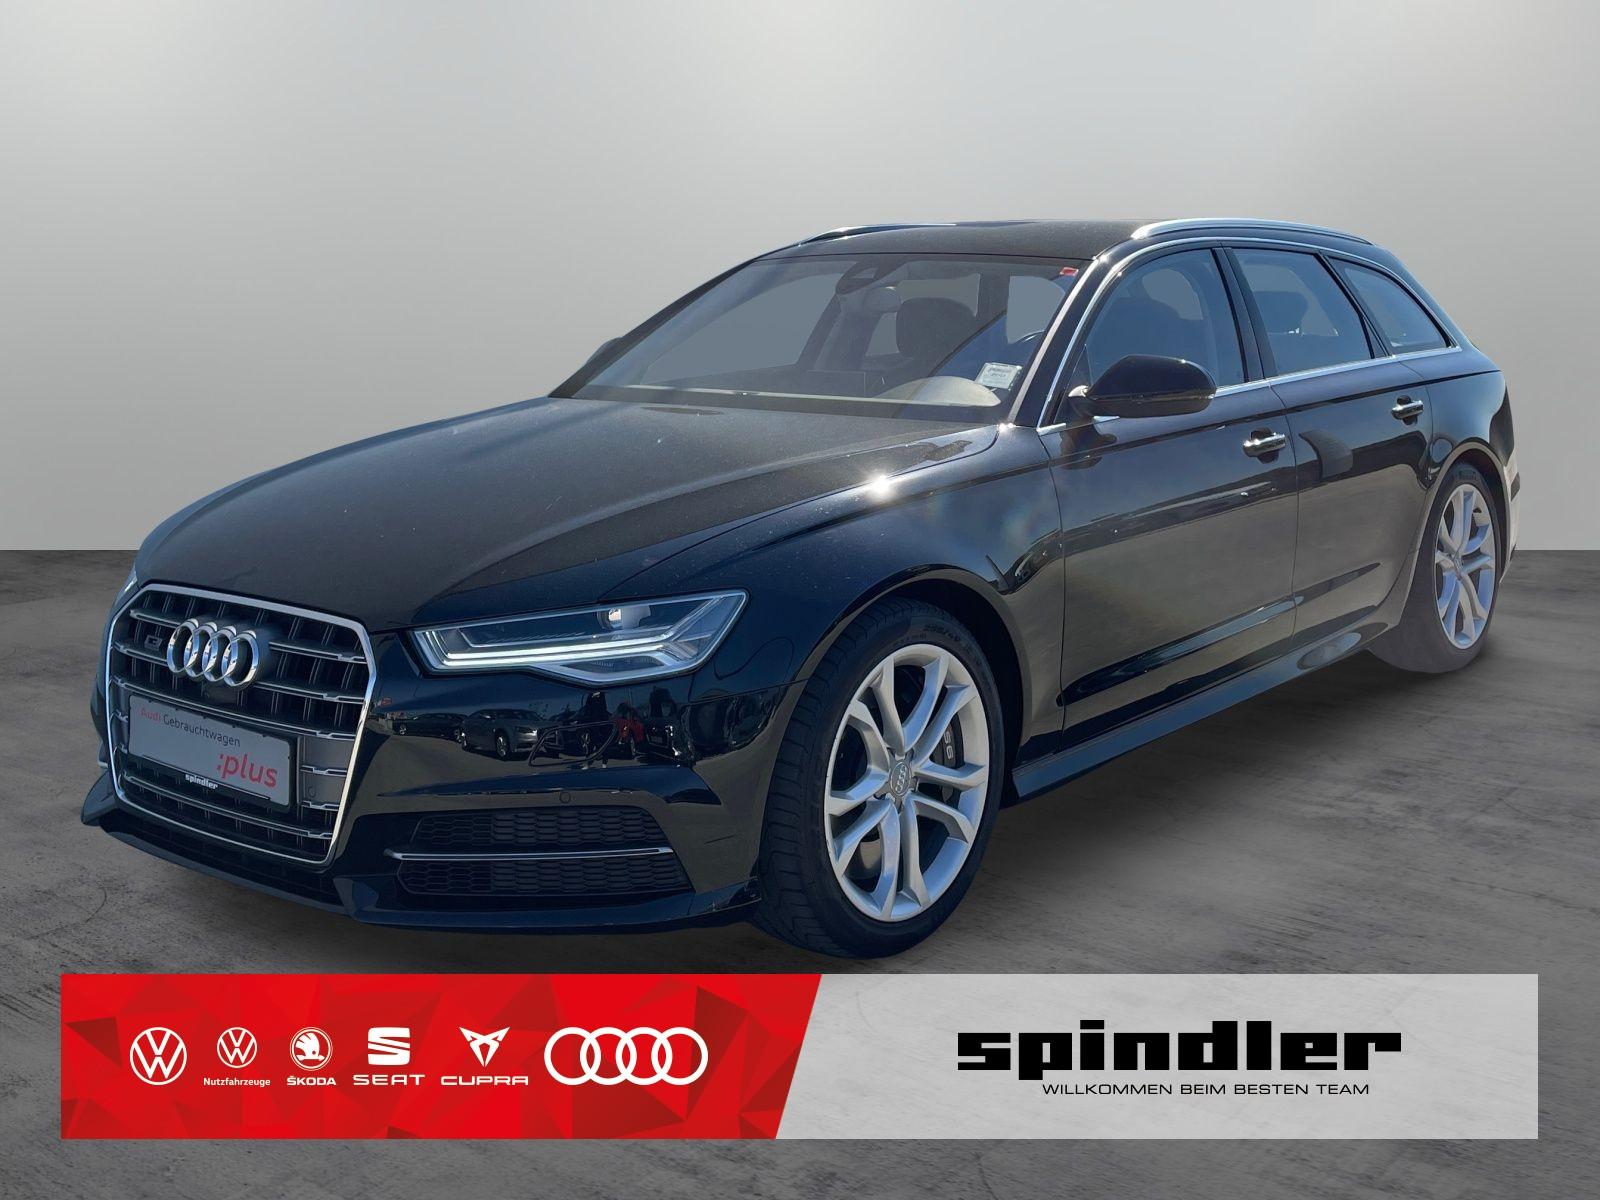 Audi S6 Avant 4.0 TFSI Quattro S-tronic / Matrix, AHK, Jahr 2018, Benzin